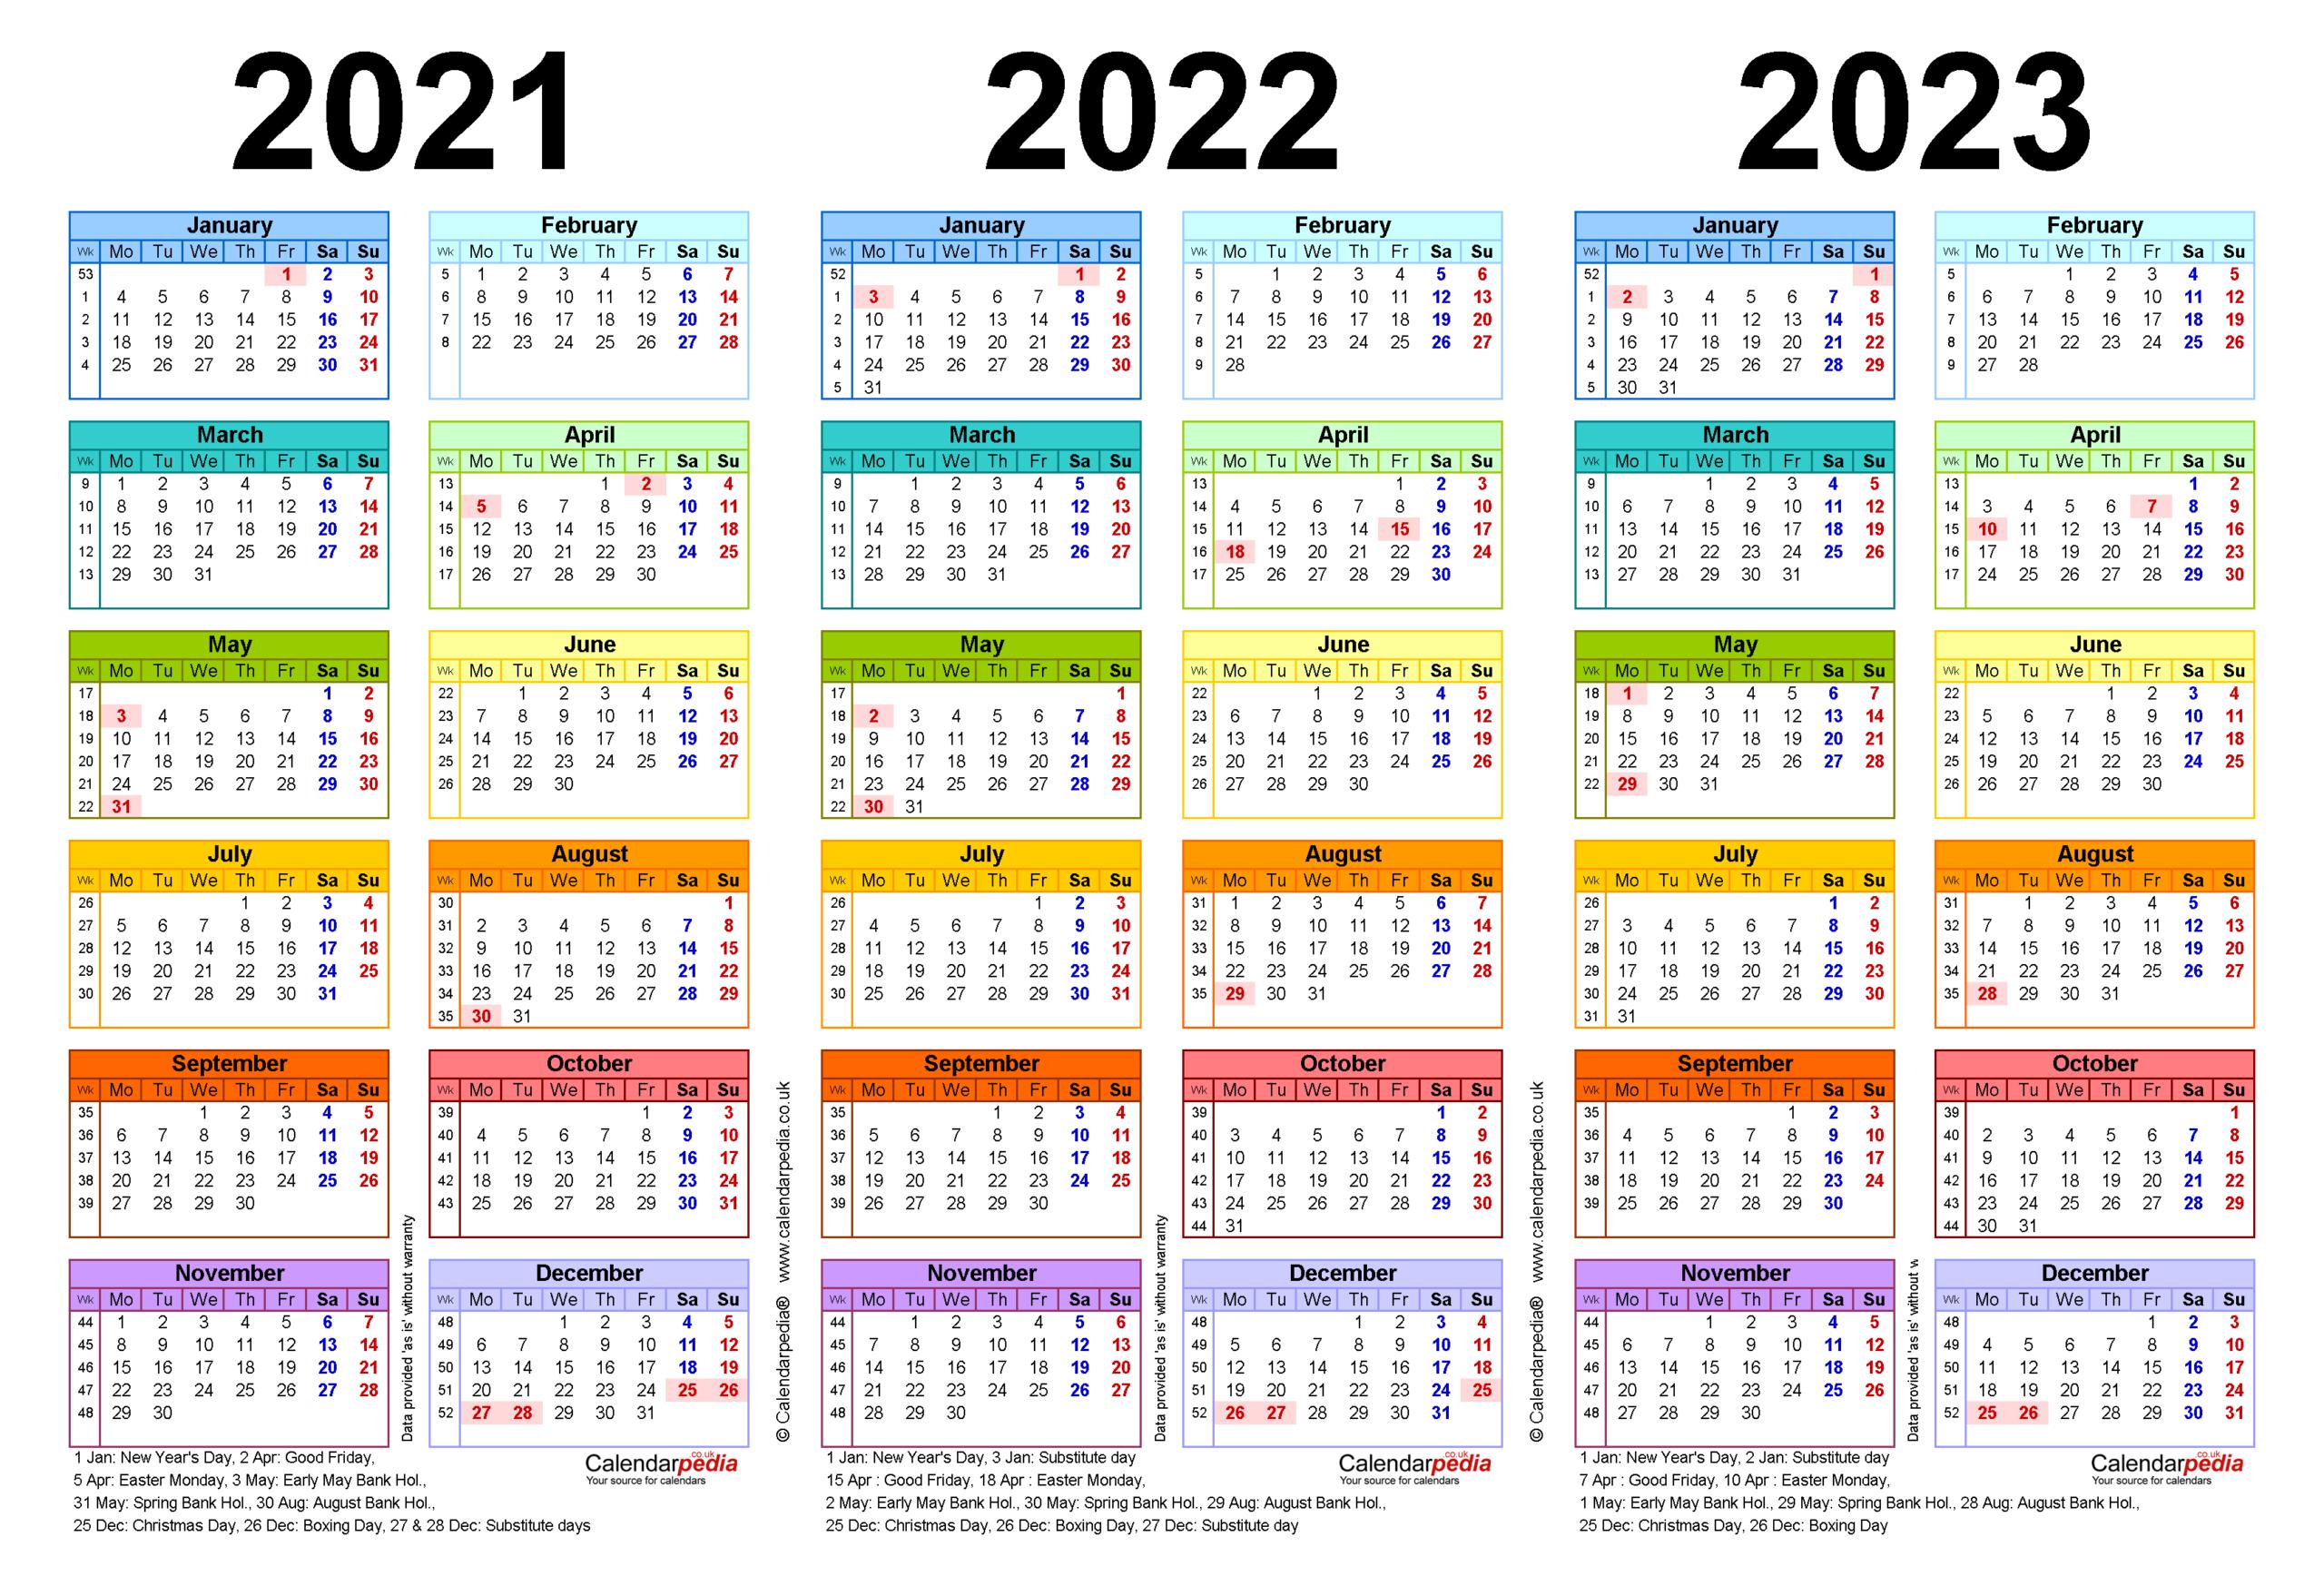 Three Year Calendars For 2021, 2022 & 2023 (Uk) For Pdf regarding 2021 - 2023 Four Year Monthly Calendar